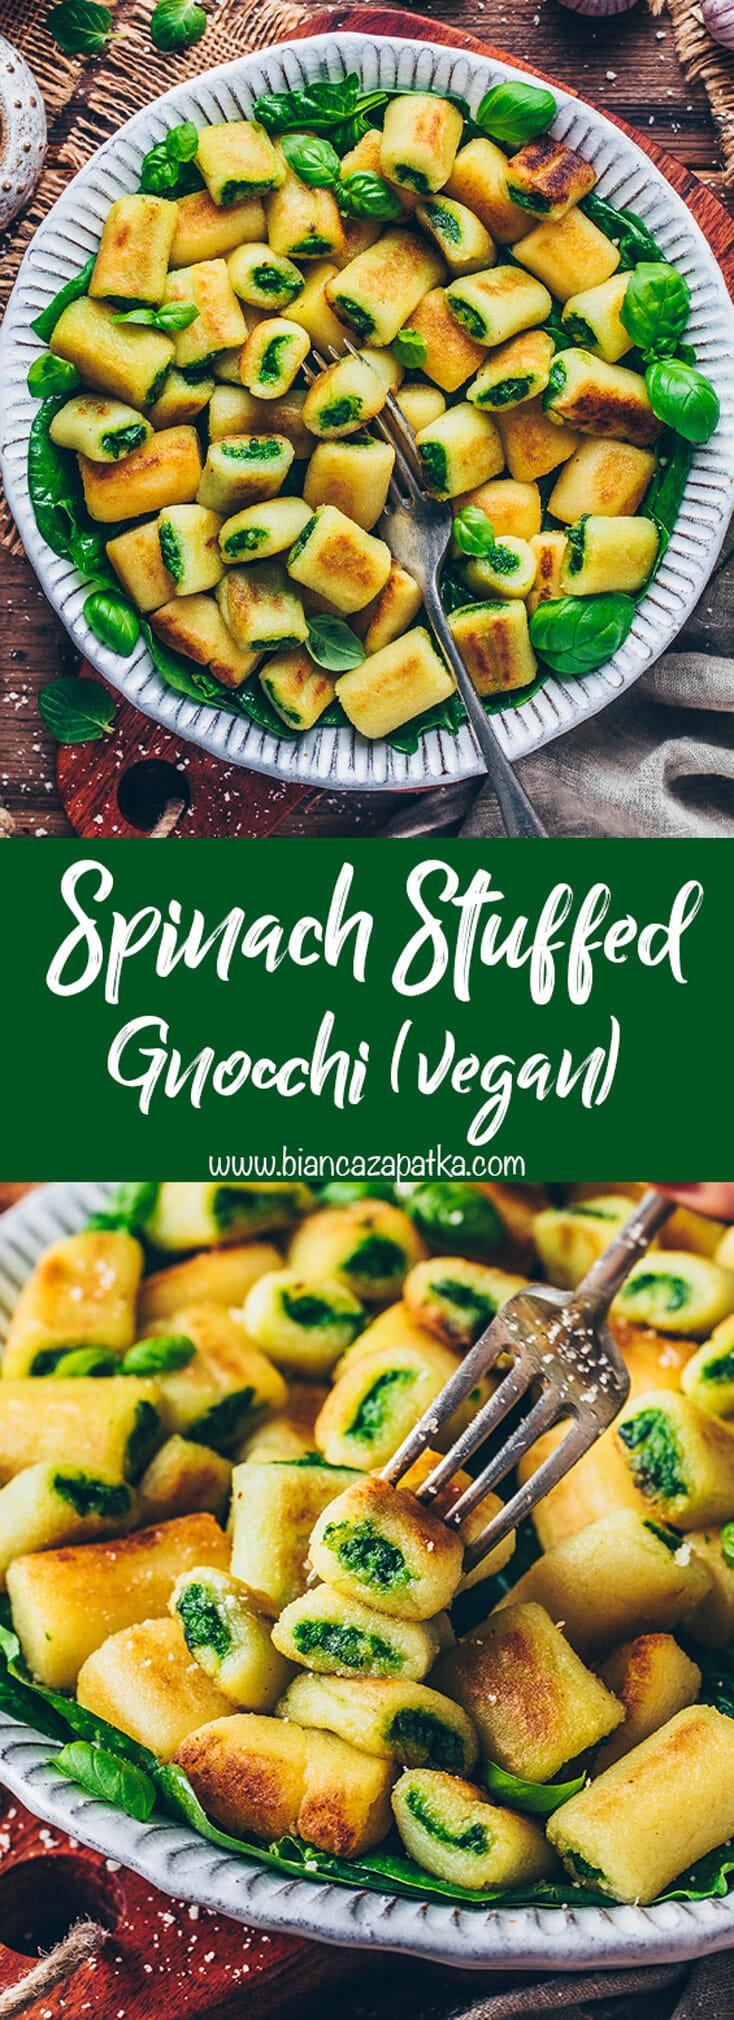 Gnocchi stuffed with Spinach Pesto and Basil (crispy mini potato dumplings)